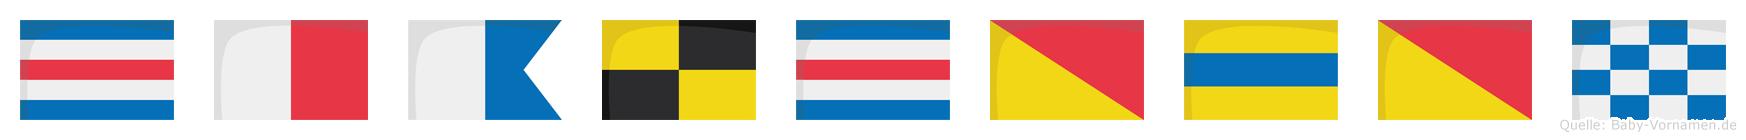 Chalcodon im Flaggenalphabet